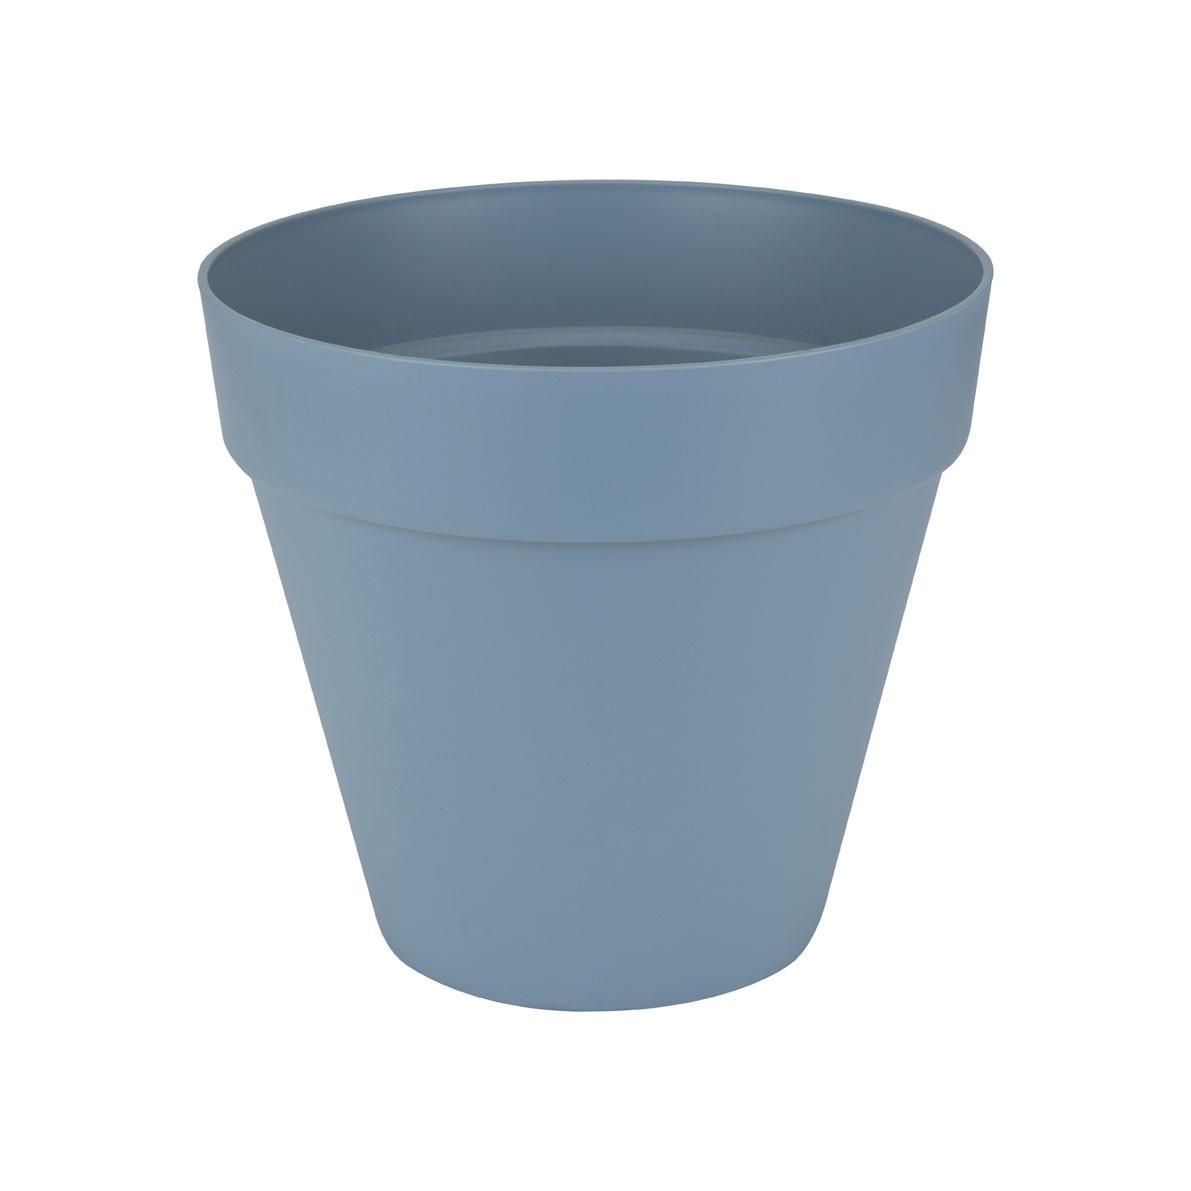 Pflanzgefäß / Pflanztopf elho Loft Urban Round Ø 25cm H 22cm blau Bild 1